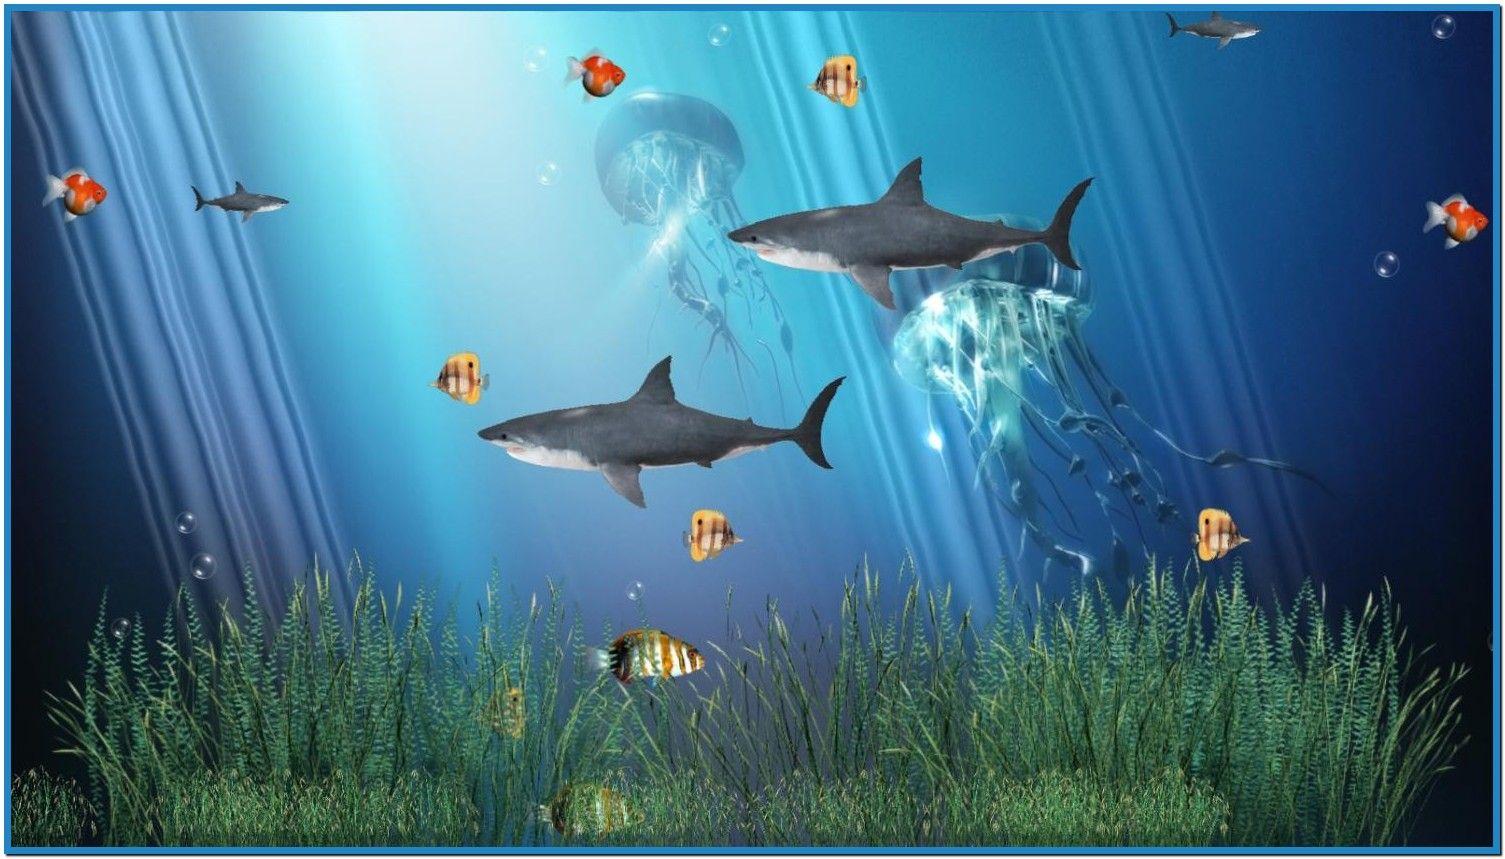 Animated Aquarium Screensavers Windows 7 Download Free Free Animated Wallpaper Animated Wallpapers For Mobile 3d Animation Wallpaper